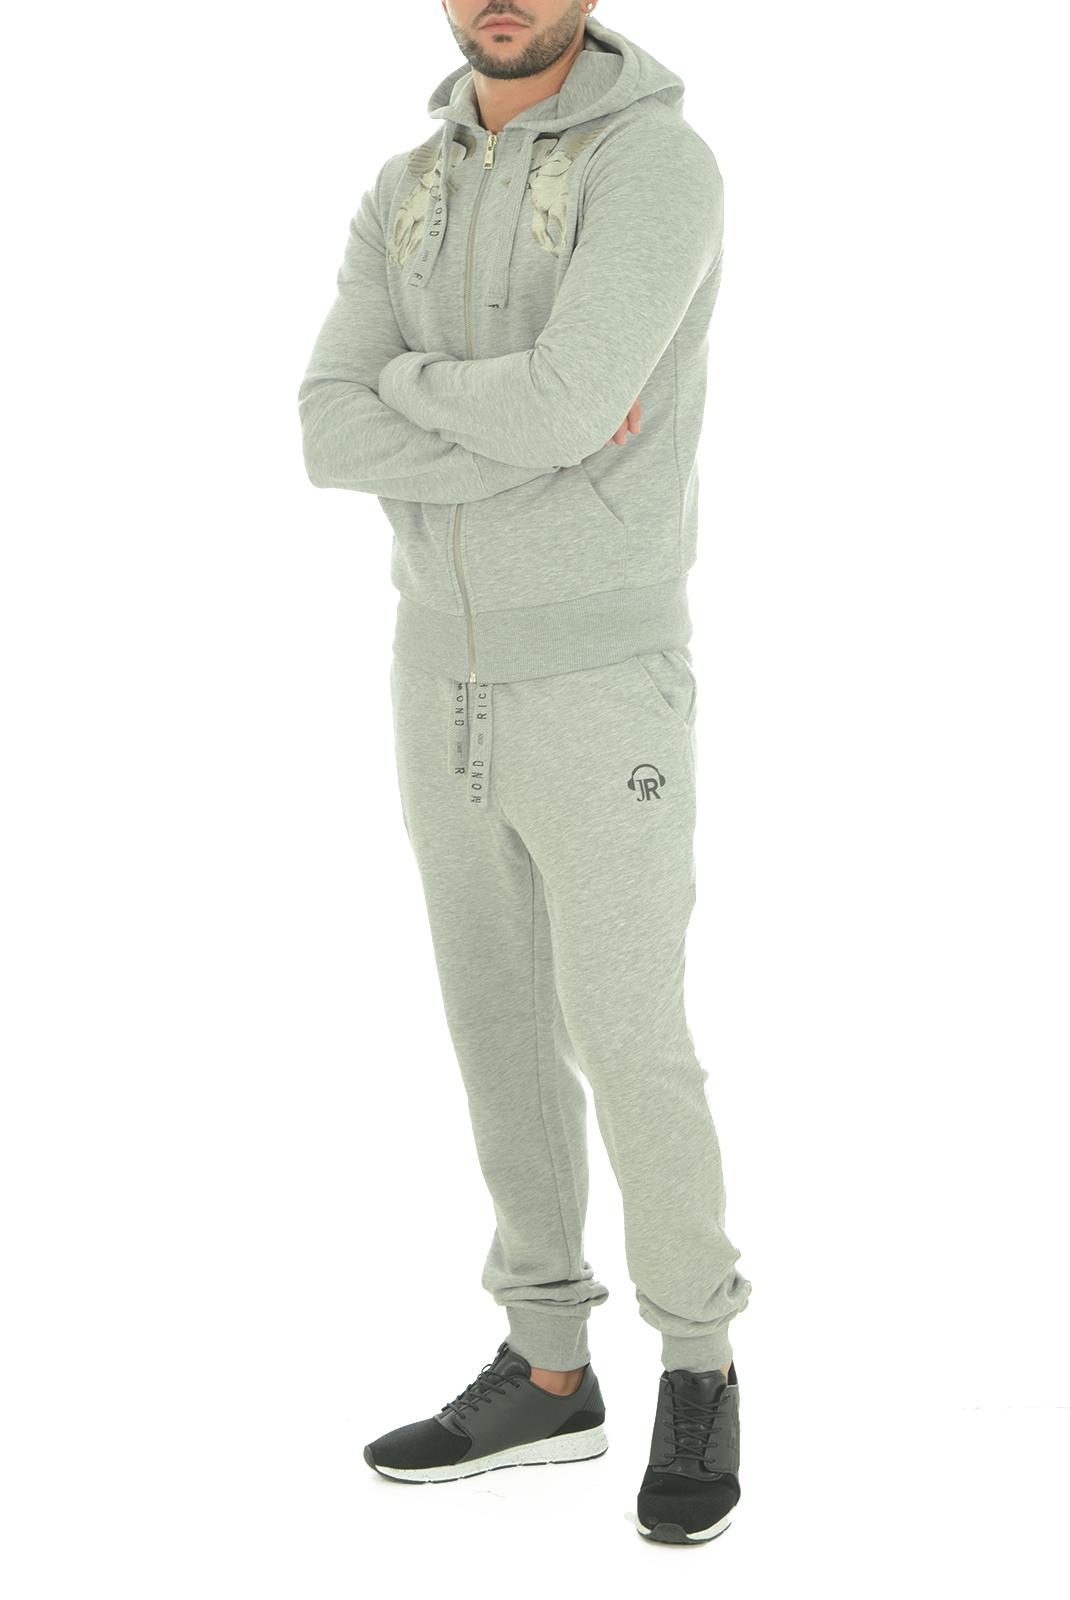 Pantalons sport/streetwear  John richmond SAPUCACIA W0066 GRIGIO MEL